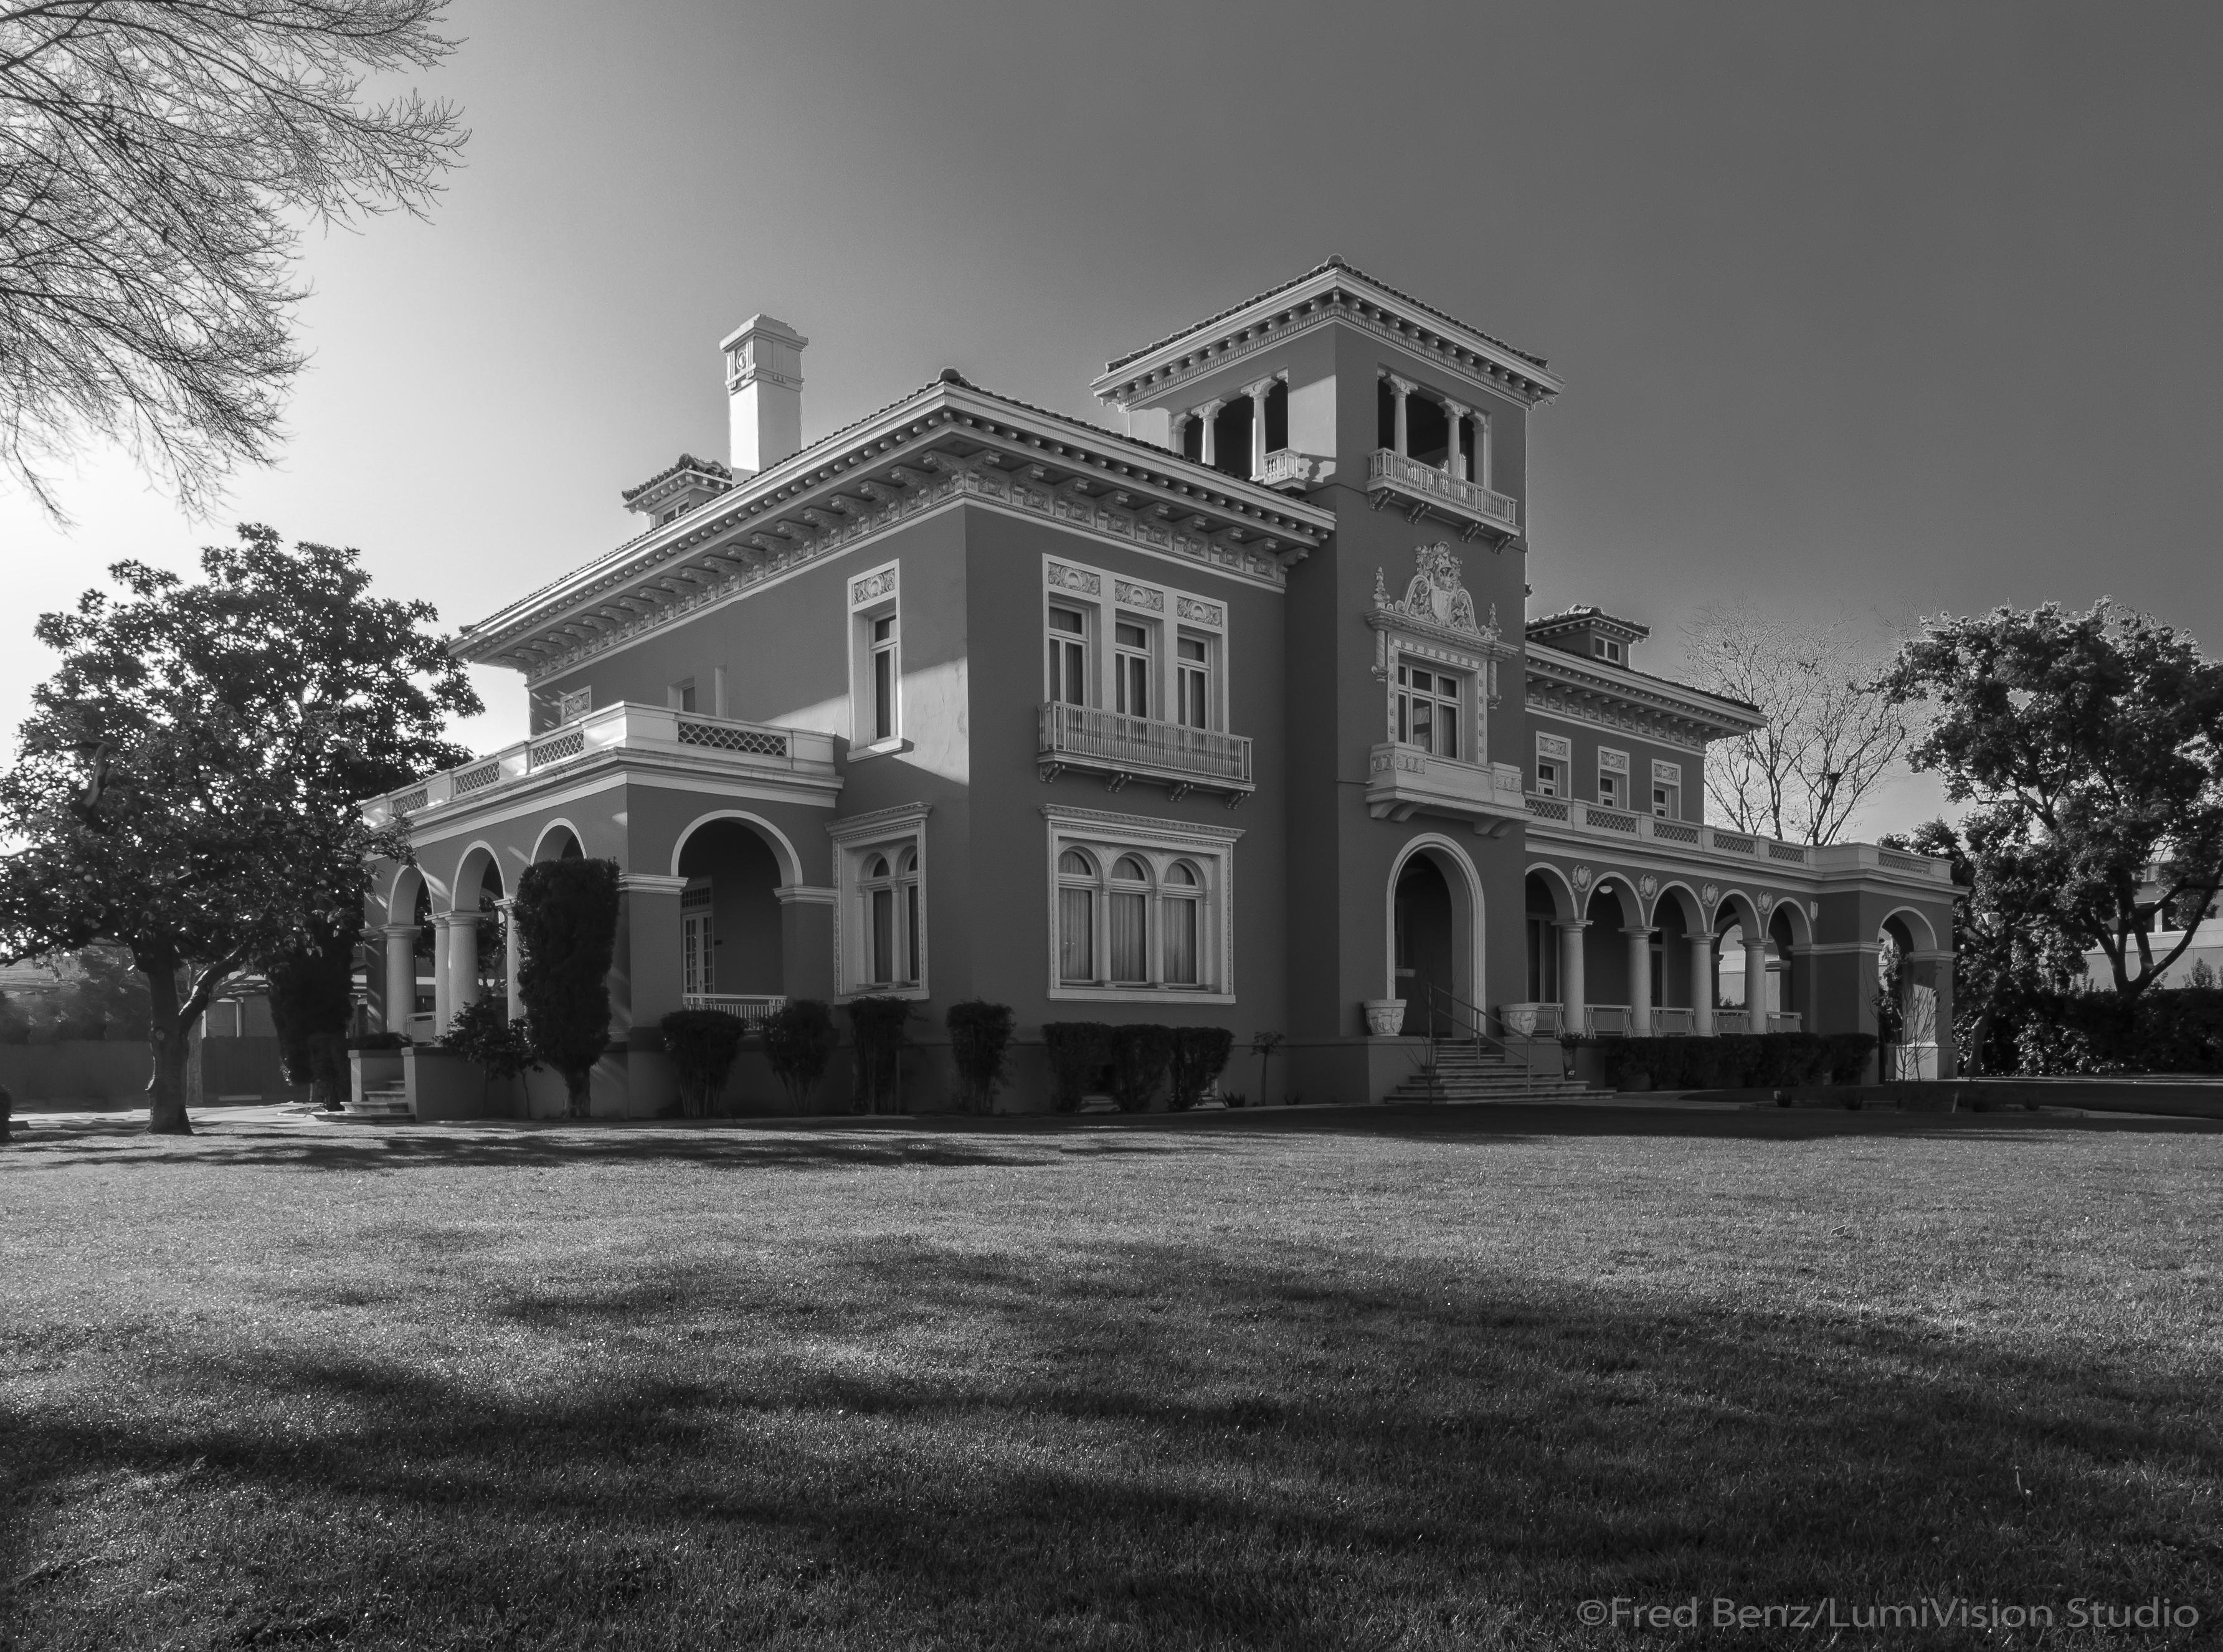 The Brix Mansion